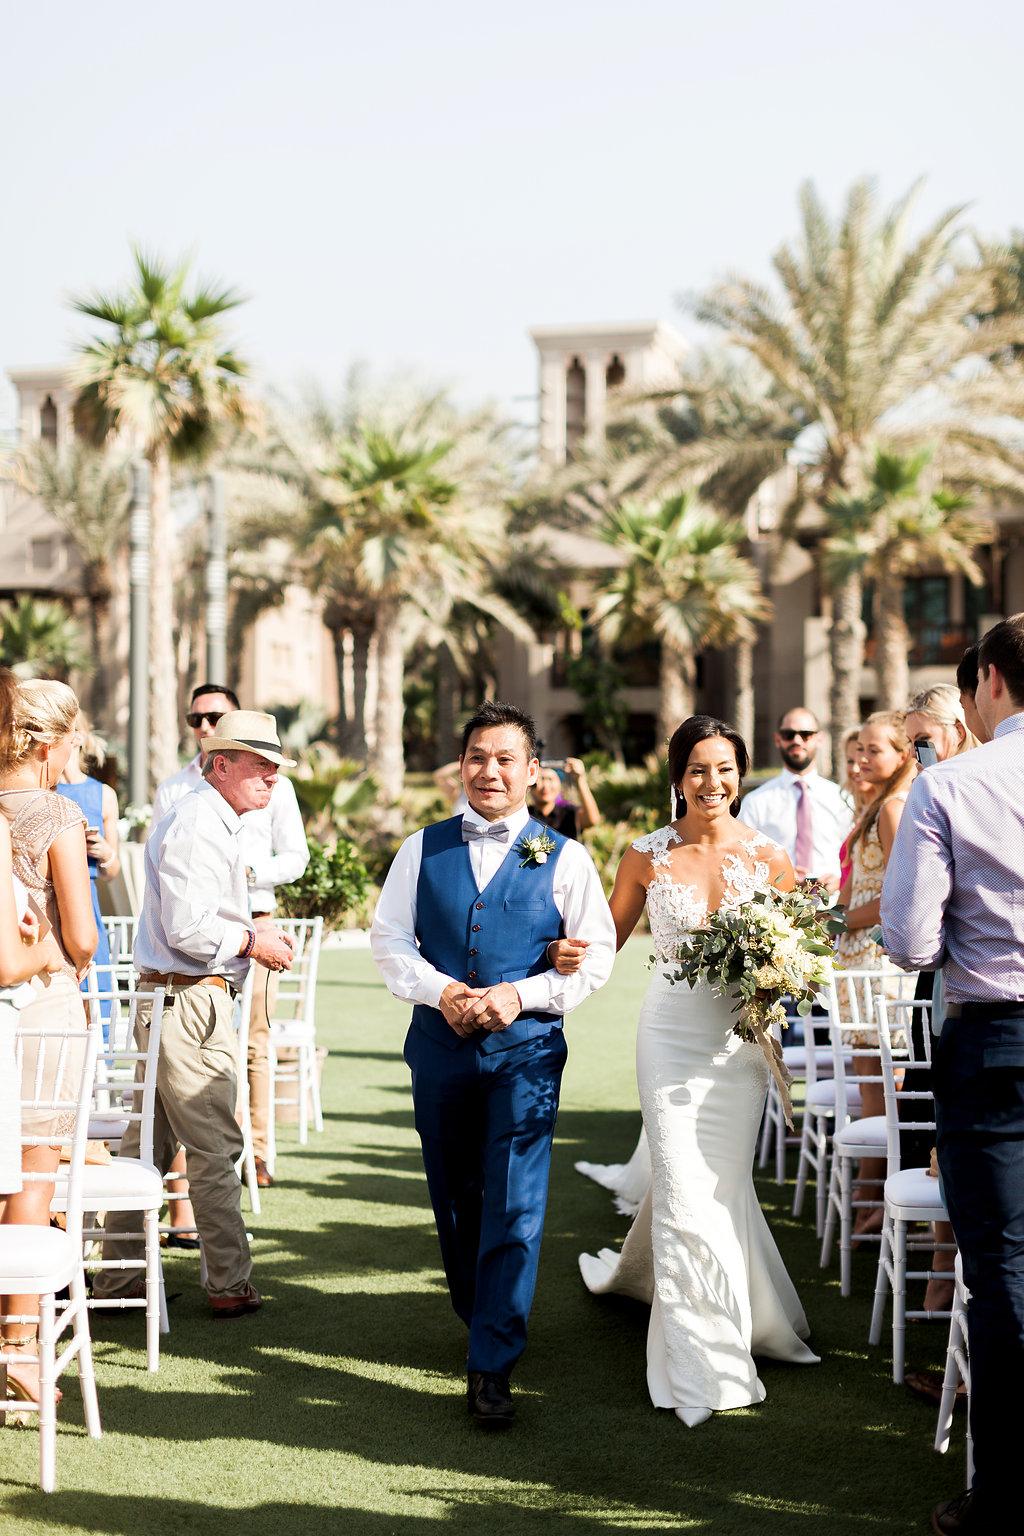 Maria_Sundin_Photography_Wedding_Dubai_Magnolia_Al_Qasr_Gemma_Ryan-180